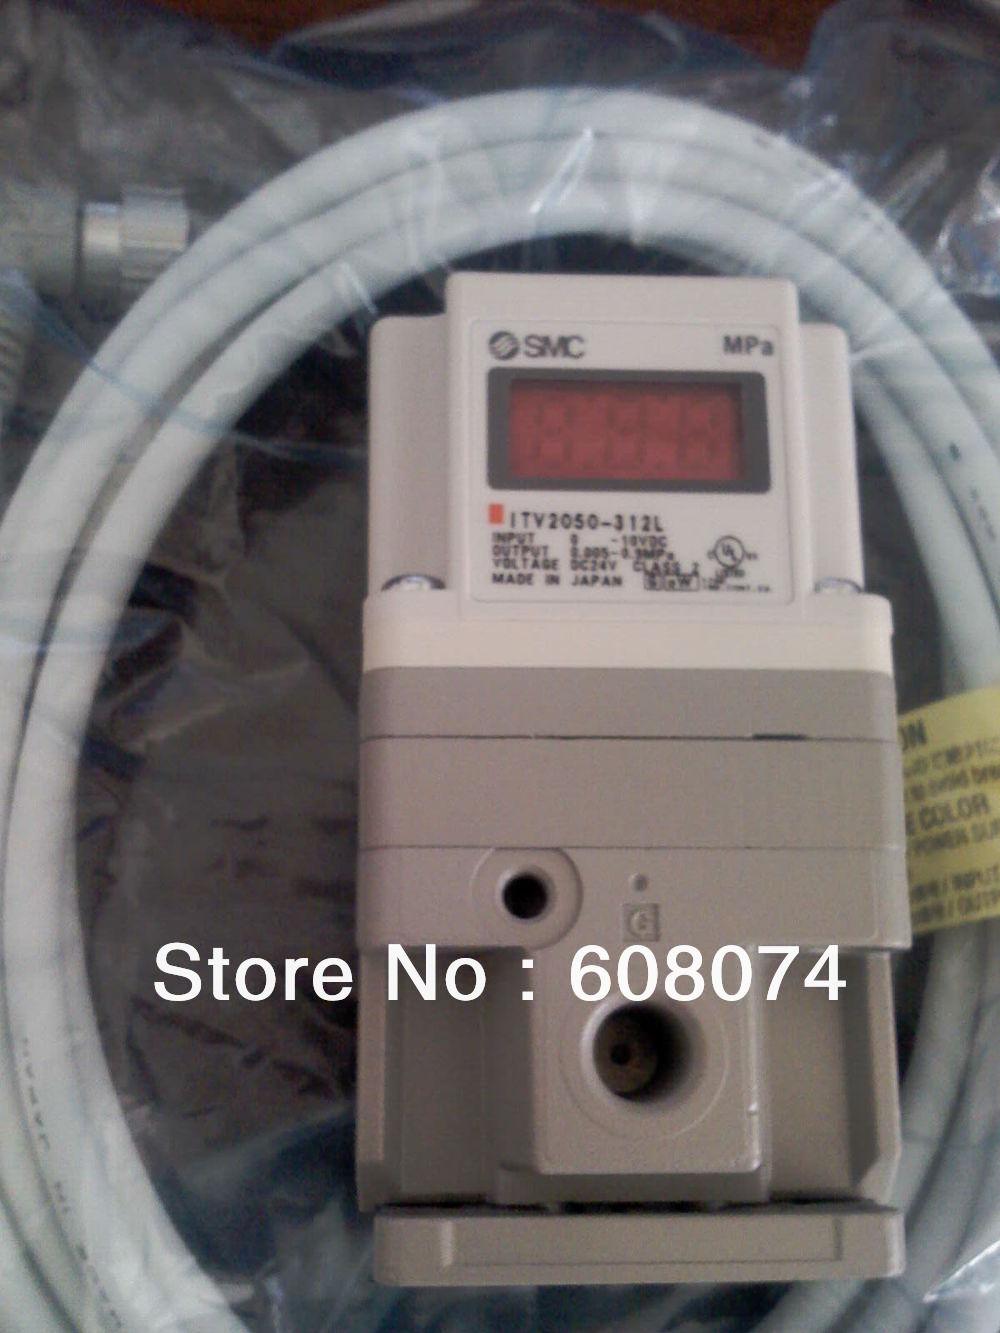 ITV2030-312L ELECTRO/PNEUMATIC REGULATOR, 24VDC 1/4 PORT 0~10V INPUT